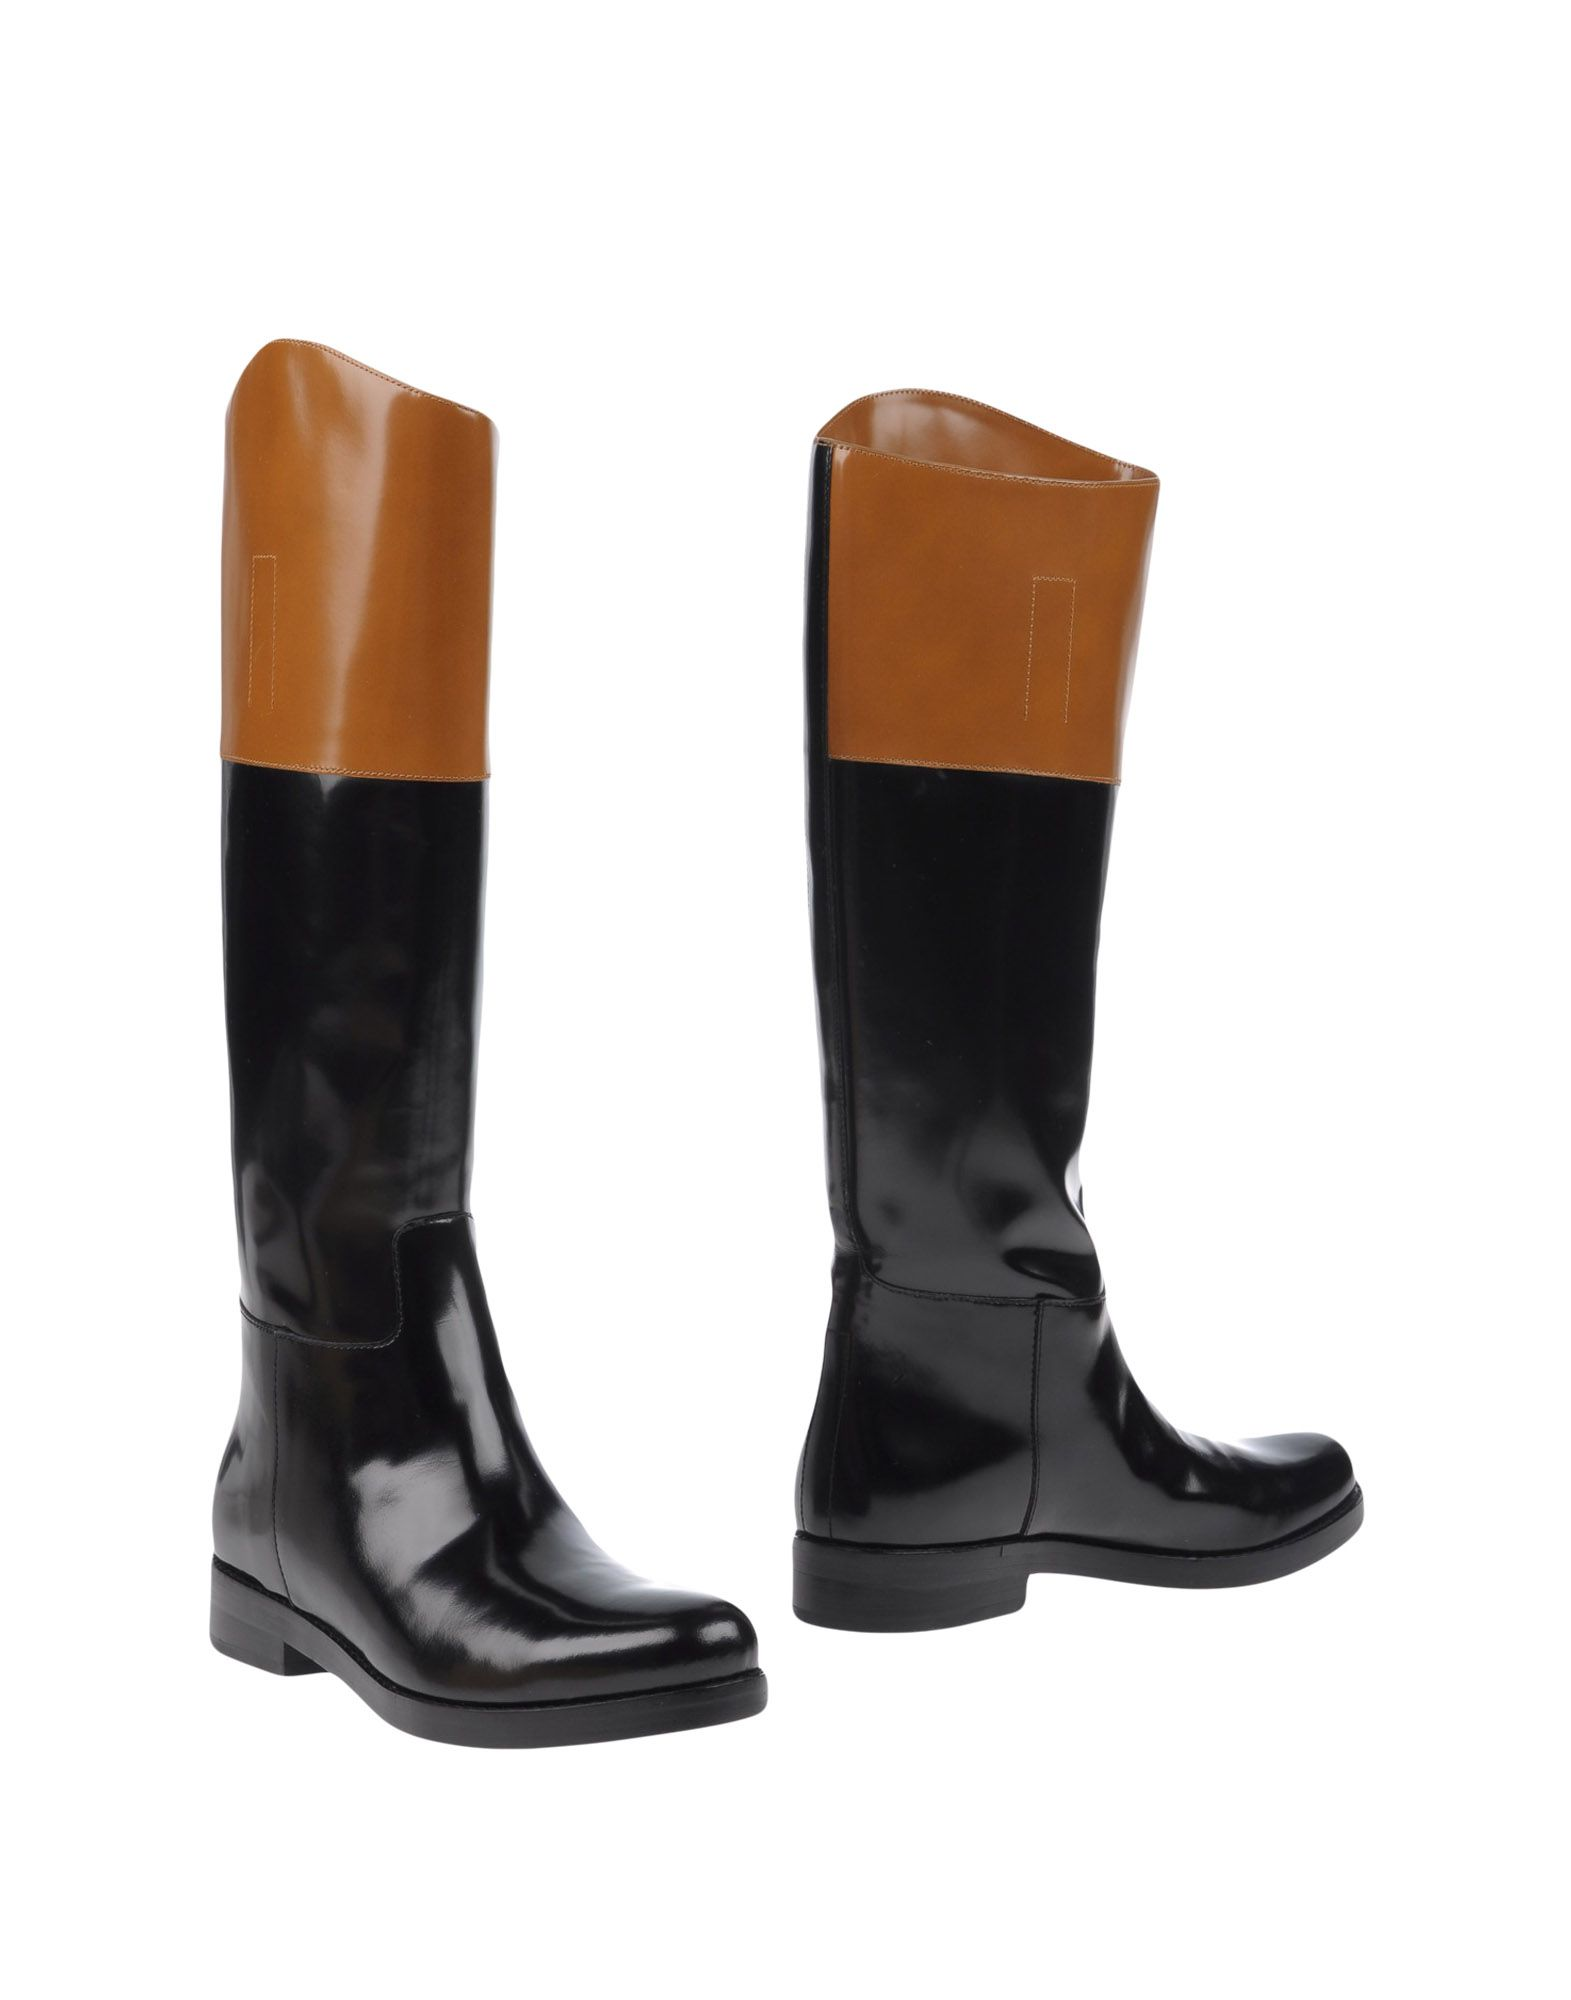 michael kors female michael kors boots